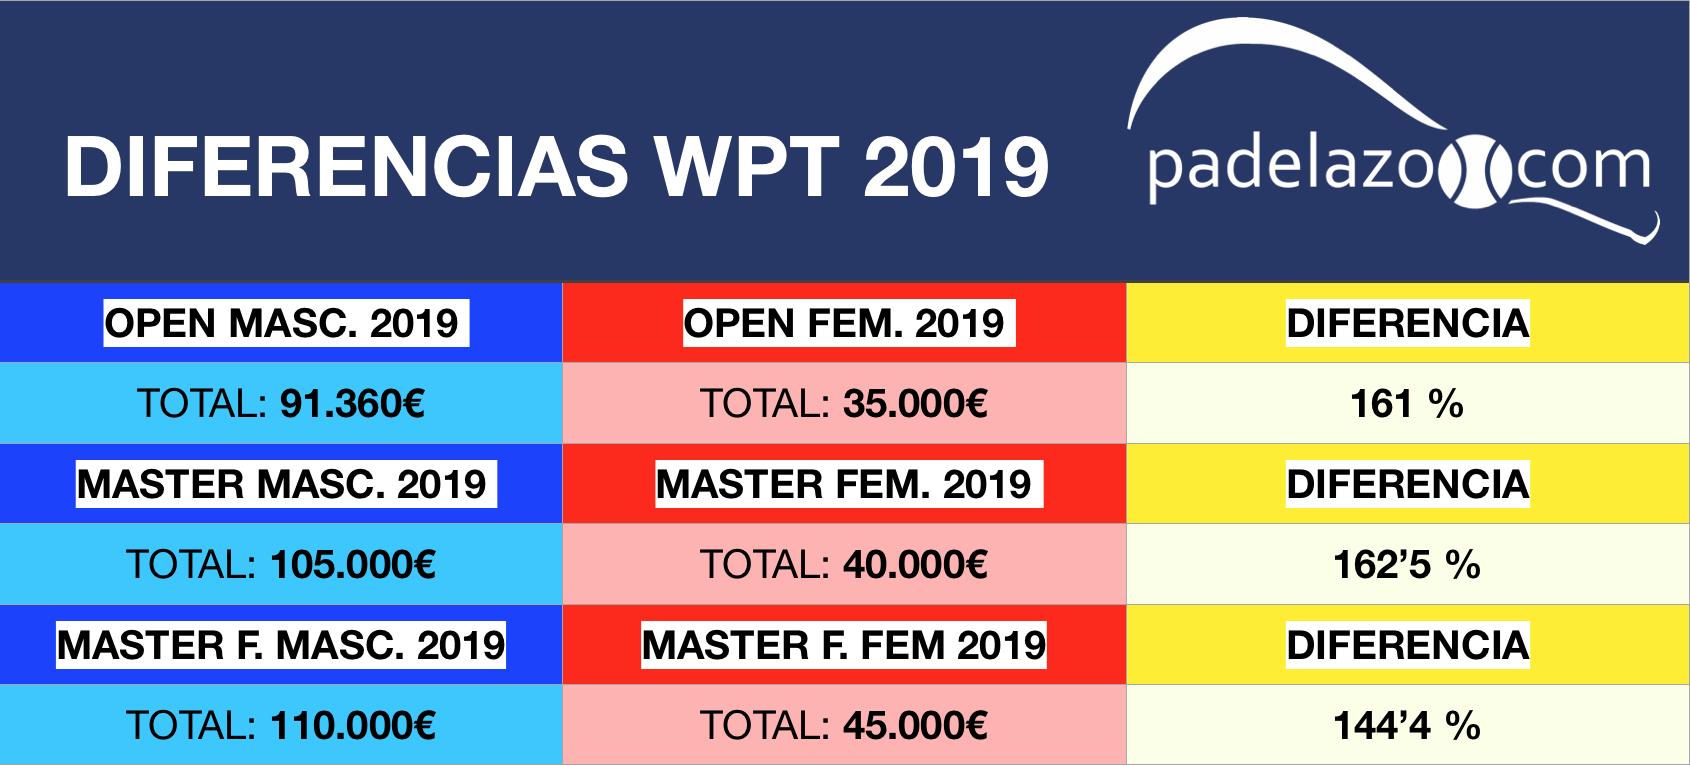 Comparativa Premios WPT masculinos femeninos 2019 - 2023